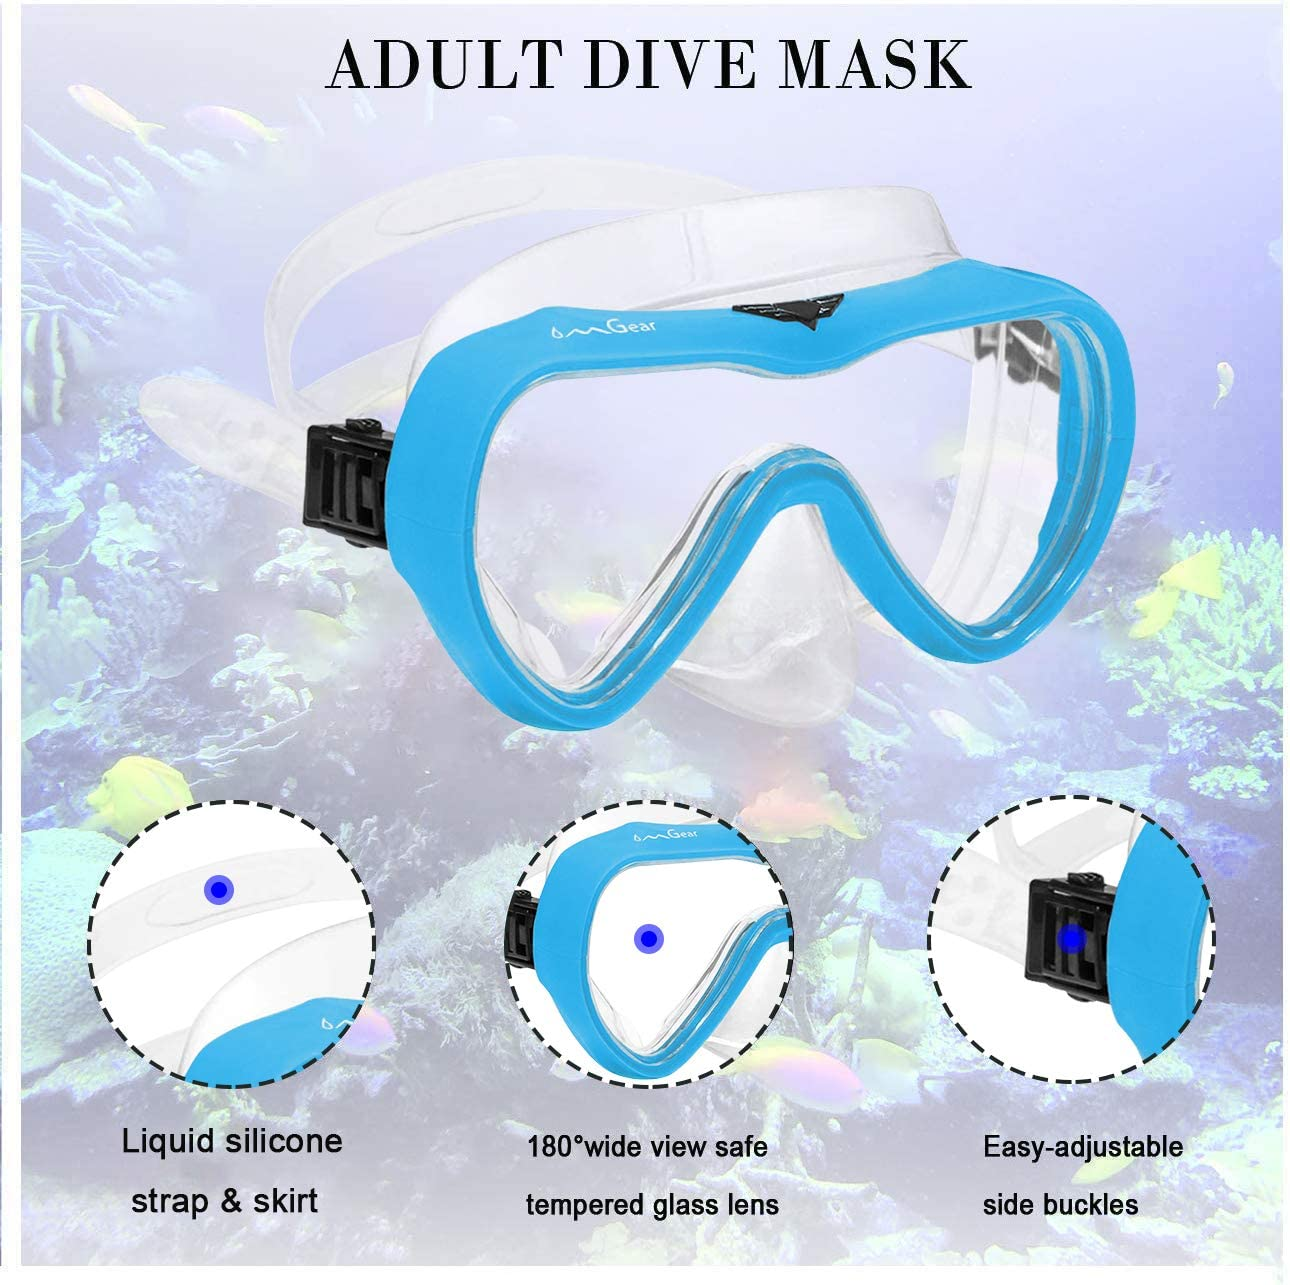 OMGear Diving Mask Snorkeling Gear Kids Adult Snorkel Mask Dive Goggles Silicone Swim Glasses Scuba Free Diving Spearfishing Anti-Leak Anti-Fog Neoprene Strap Cover Wathet Blue